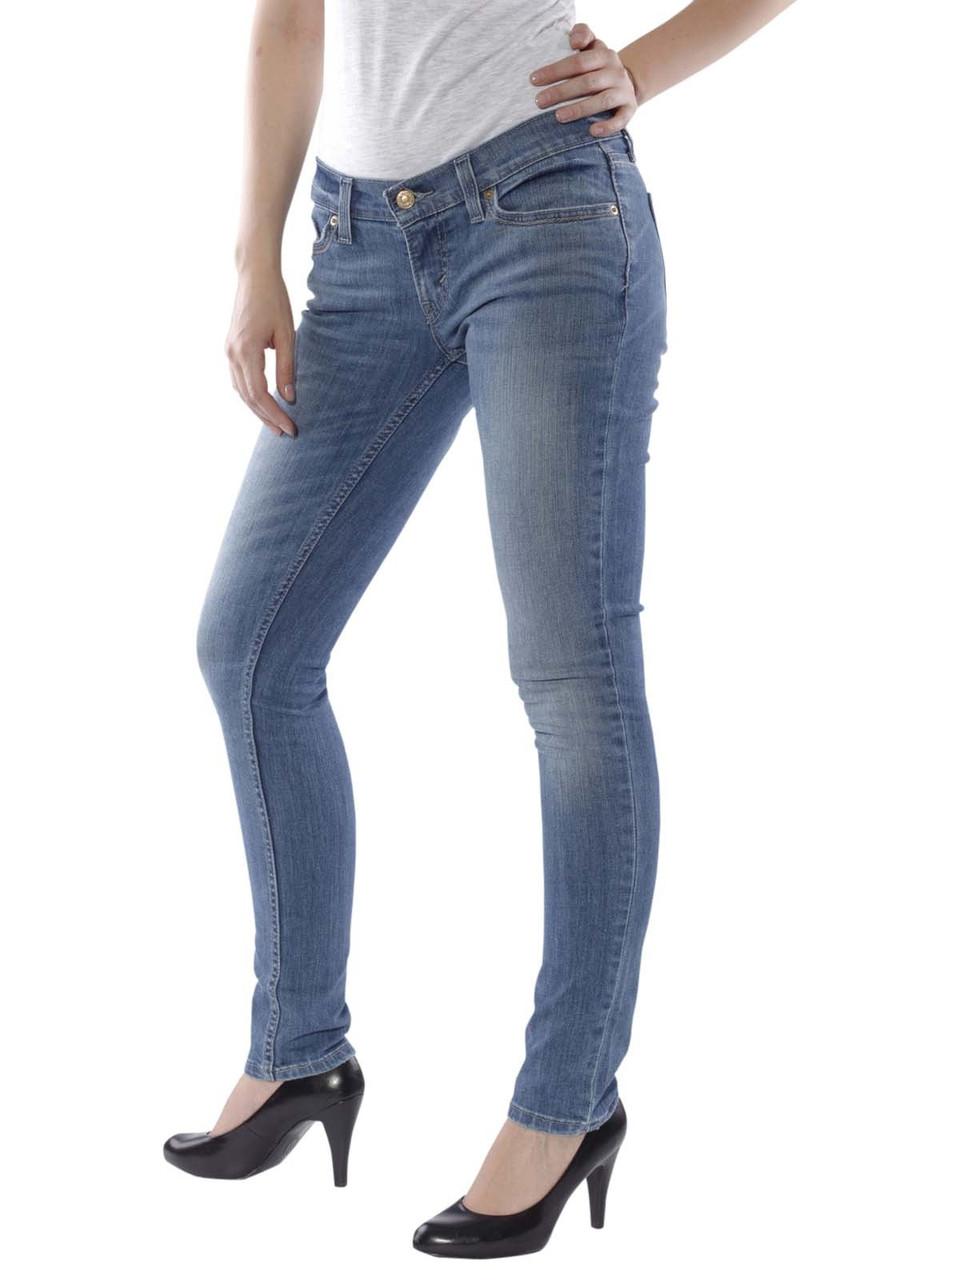 14114ce2c4b Женские джинсы Levis 524 Skinny Jeans 11499-0002